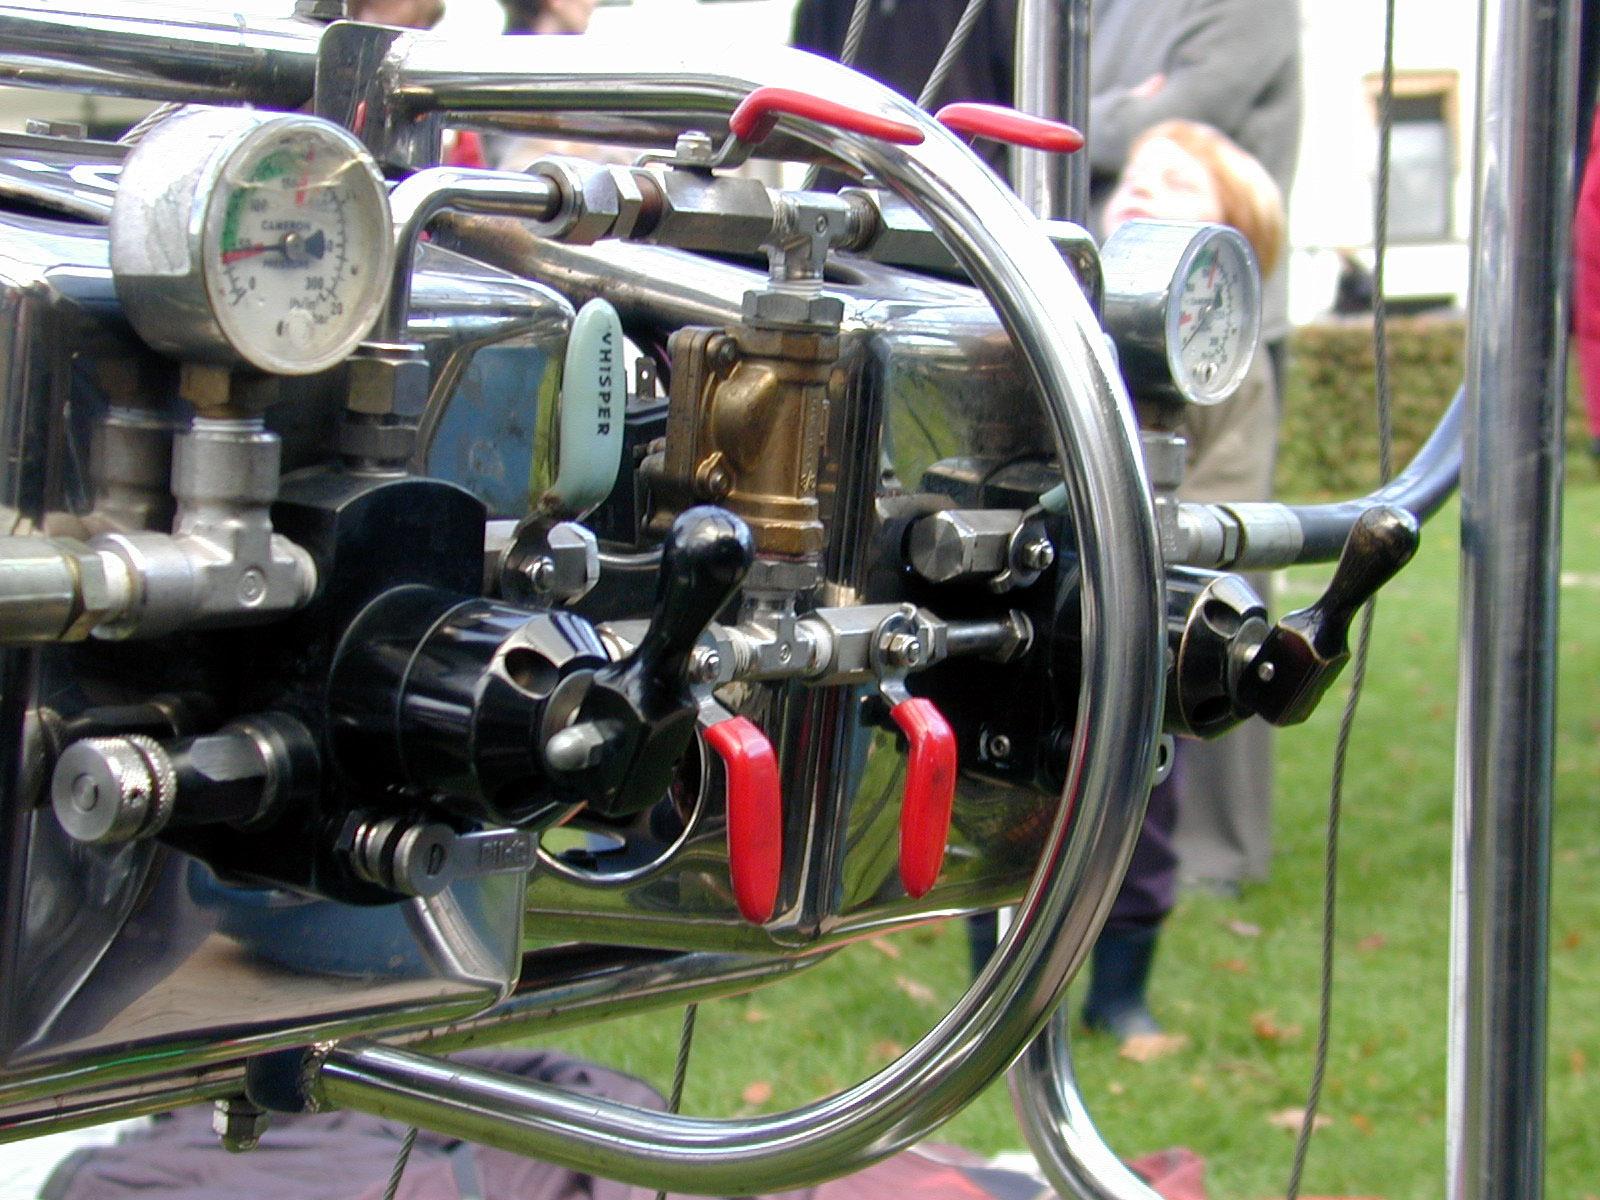 mechanics equipment gauge gauges lever levers handle handles pipe pipes tube tubes chrome metal plastic ballooning balooning